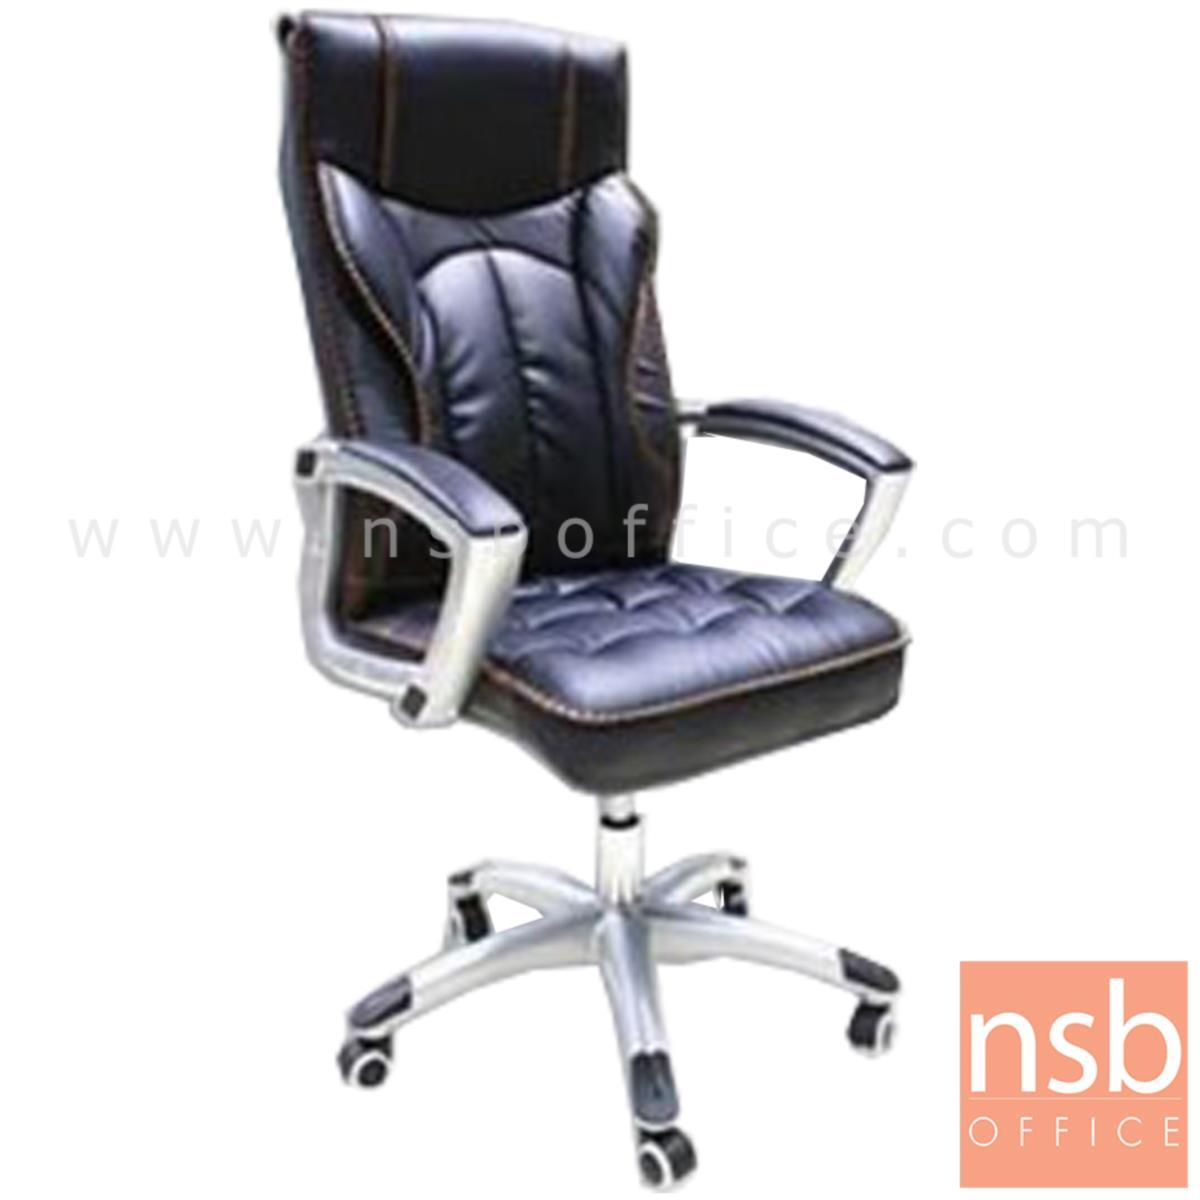 B01A500:เก้าอี้สำนักงาน รุ่น BABOON (บาบูน)  ขาเหล็ก